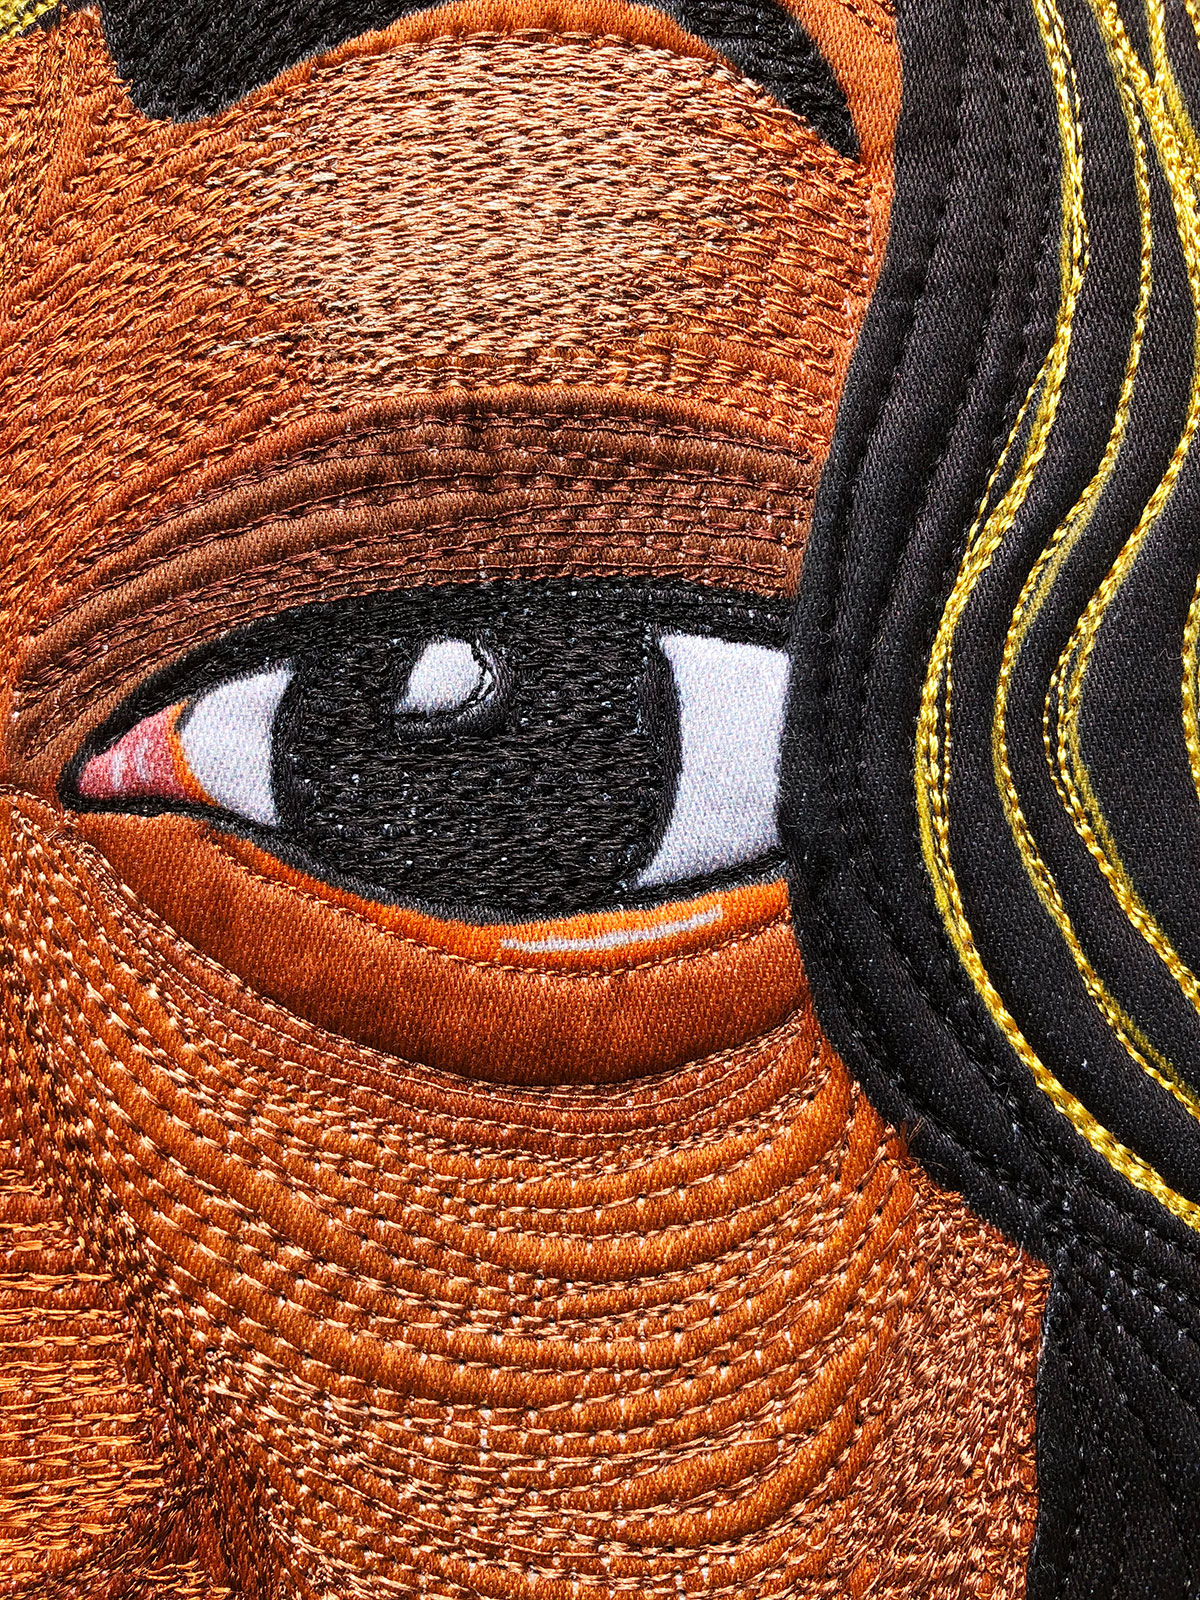 Charleena Lyles   Fiber Art   Thread Painting   Textile Art   Art Quilt   #CharleenaLyles